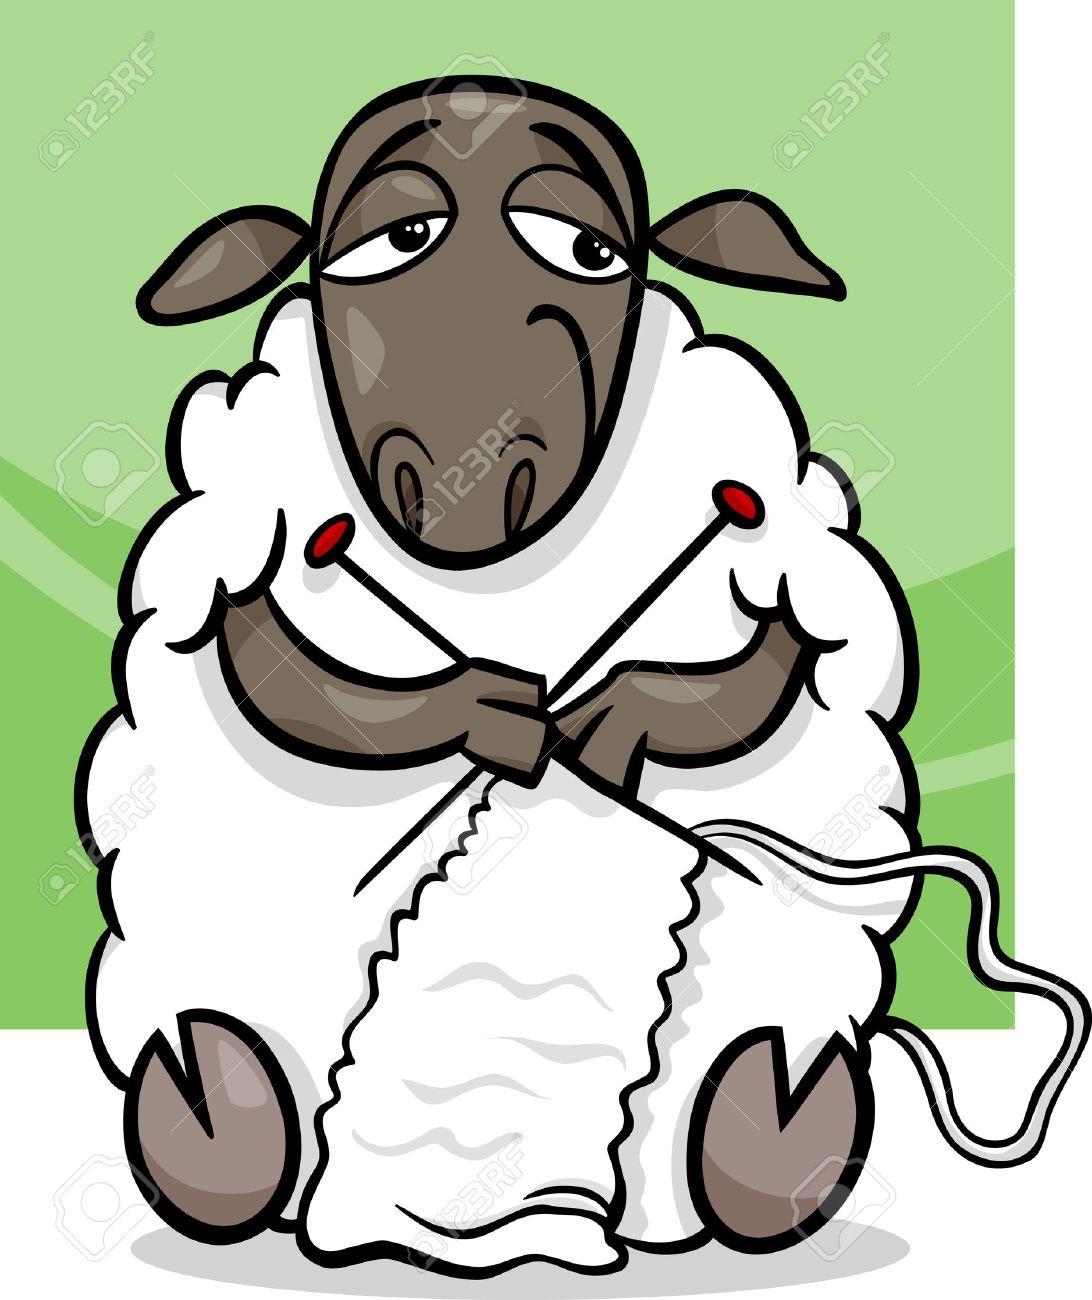 1092x1300 Cartoon Illustration Of Funny Sheep Farm Animal Knitting Royalty